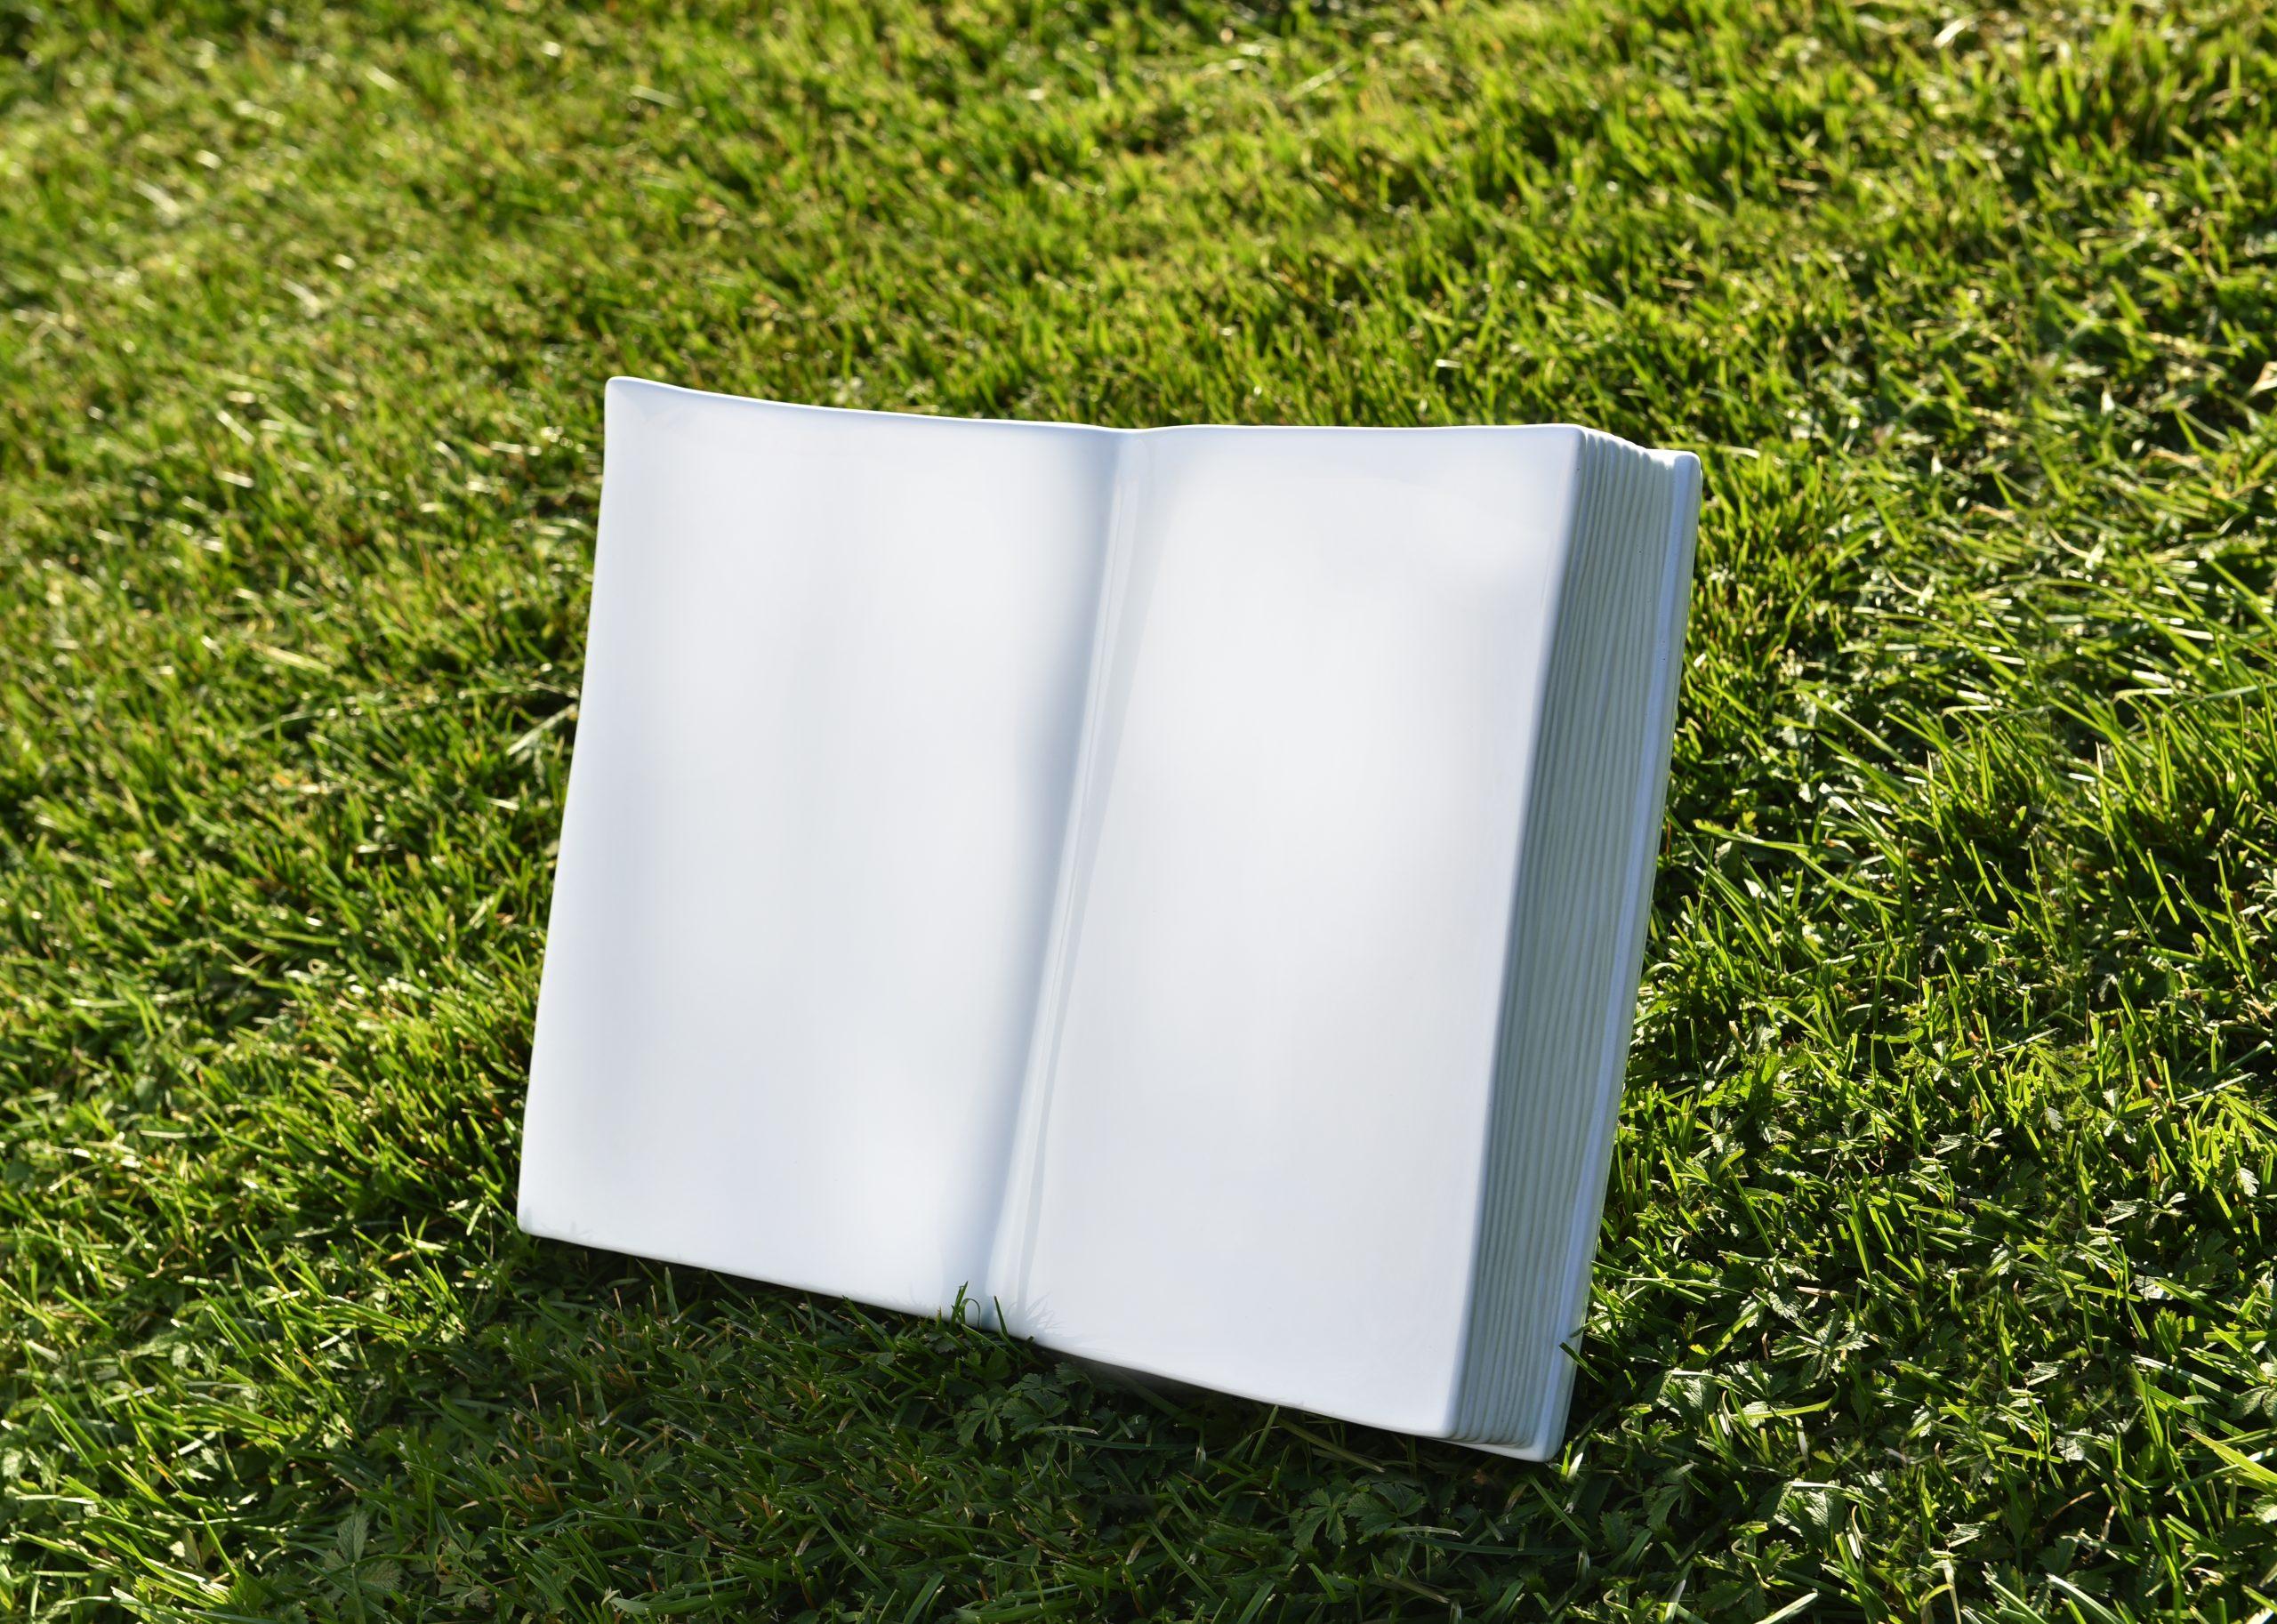 Bassano Ambientata book